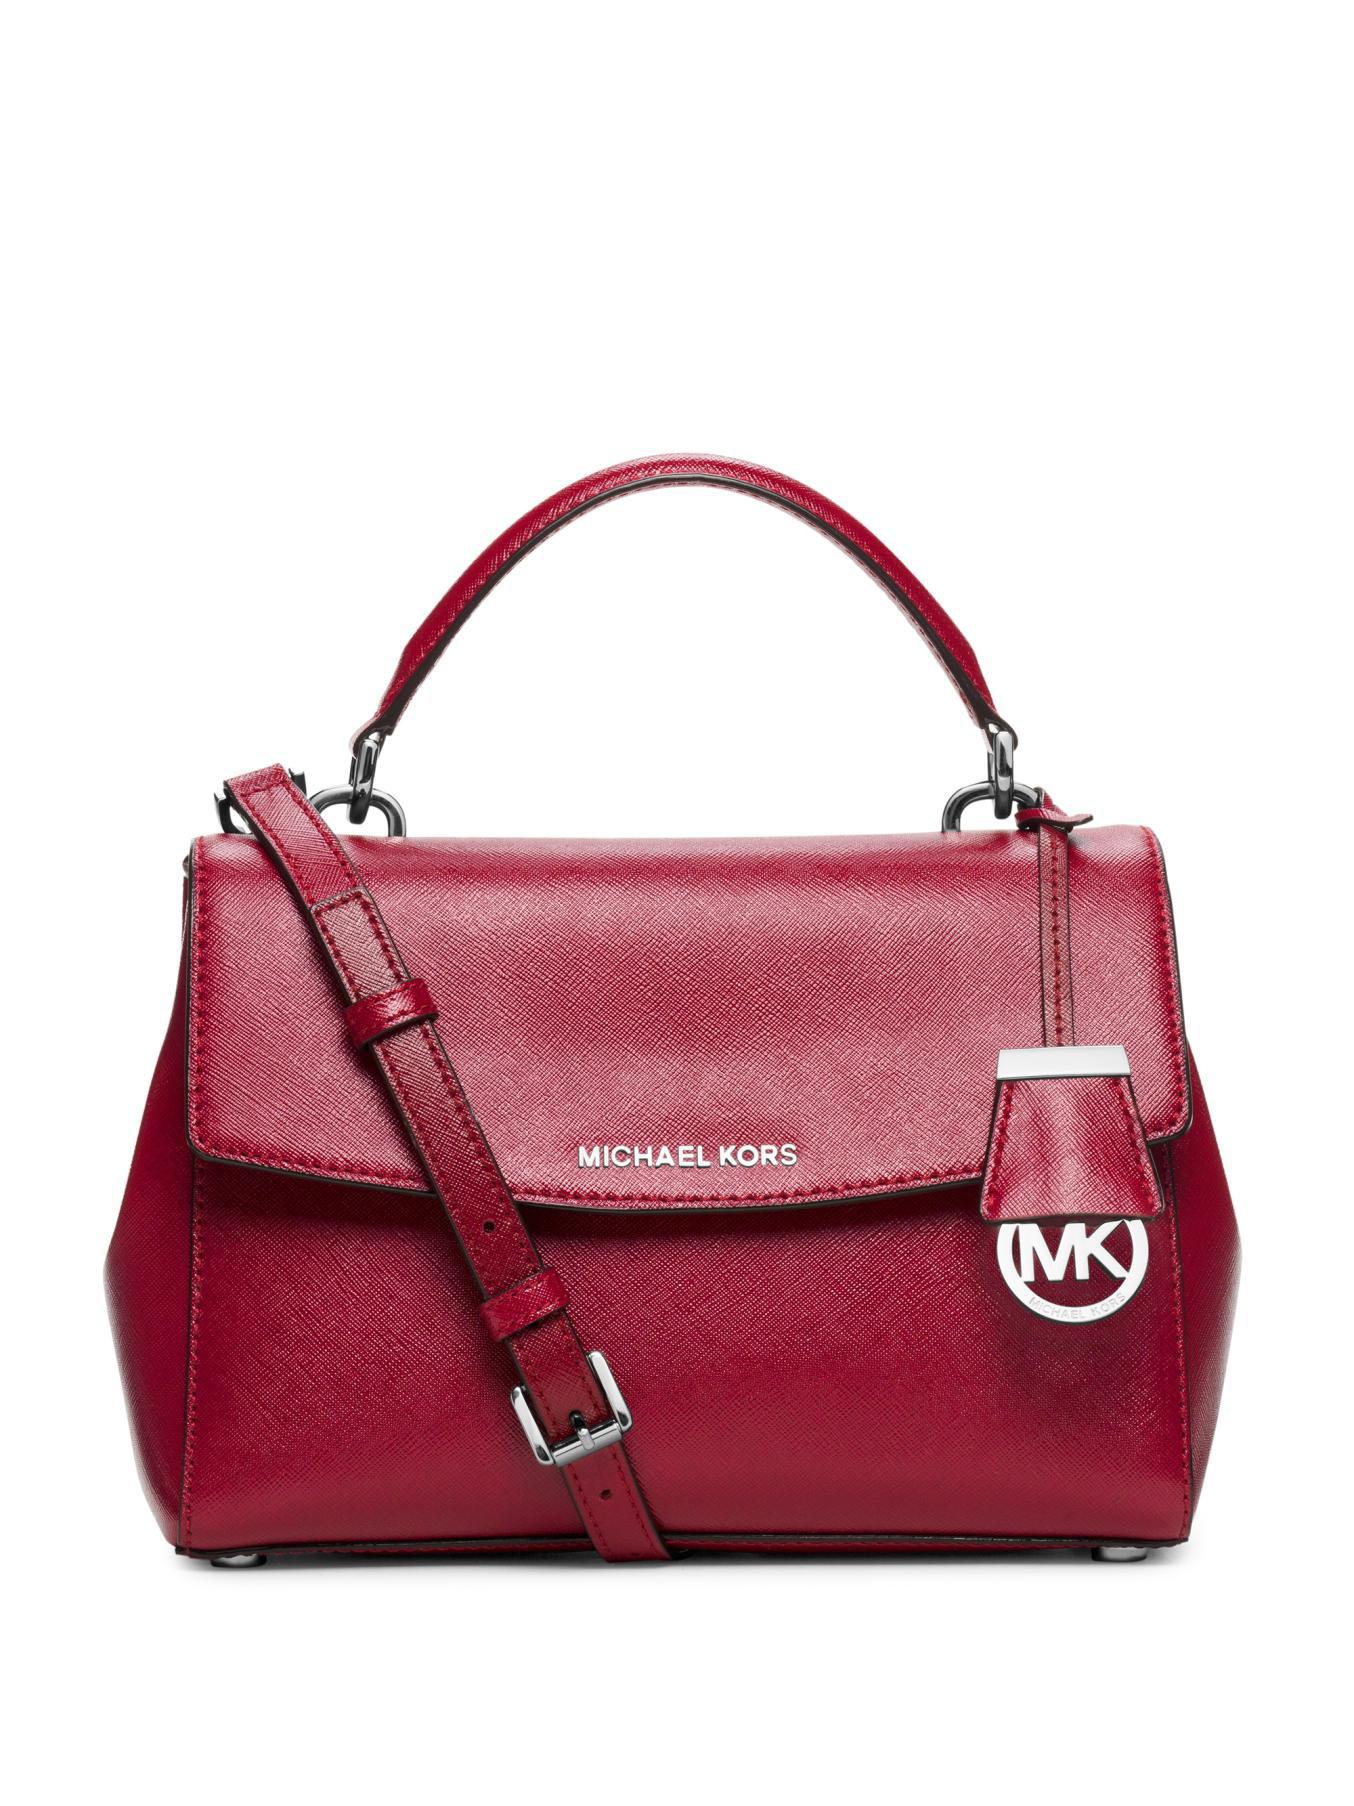 7f05d82fea21 Lyst - MICHAEL Michael Kors Ava Small Patent Saffiano Leather ...